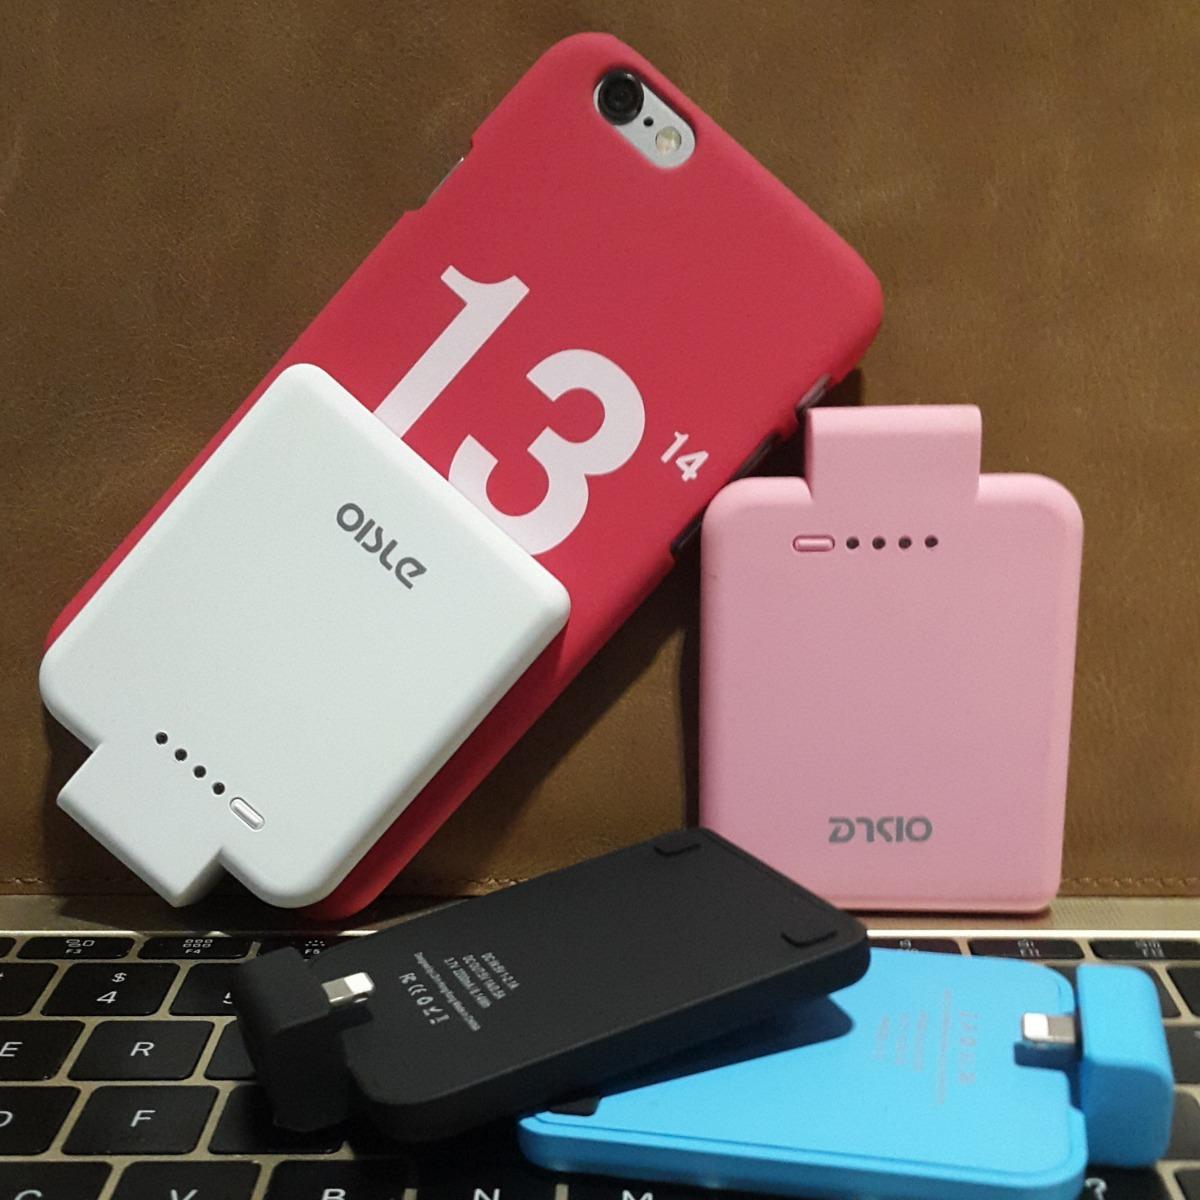 ce7d51f54a8 cargador portátil power bank 2200mah iphone 6 6s 7 plus ipad. Cargando zoom.